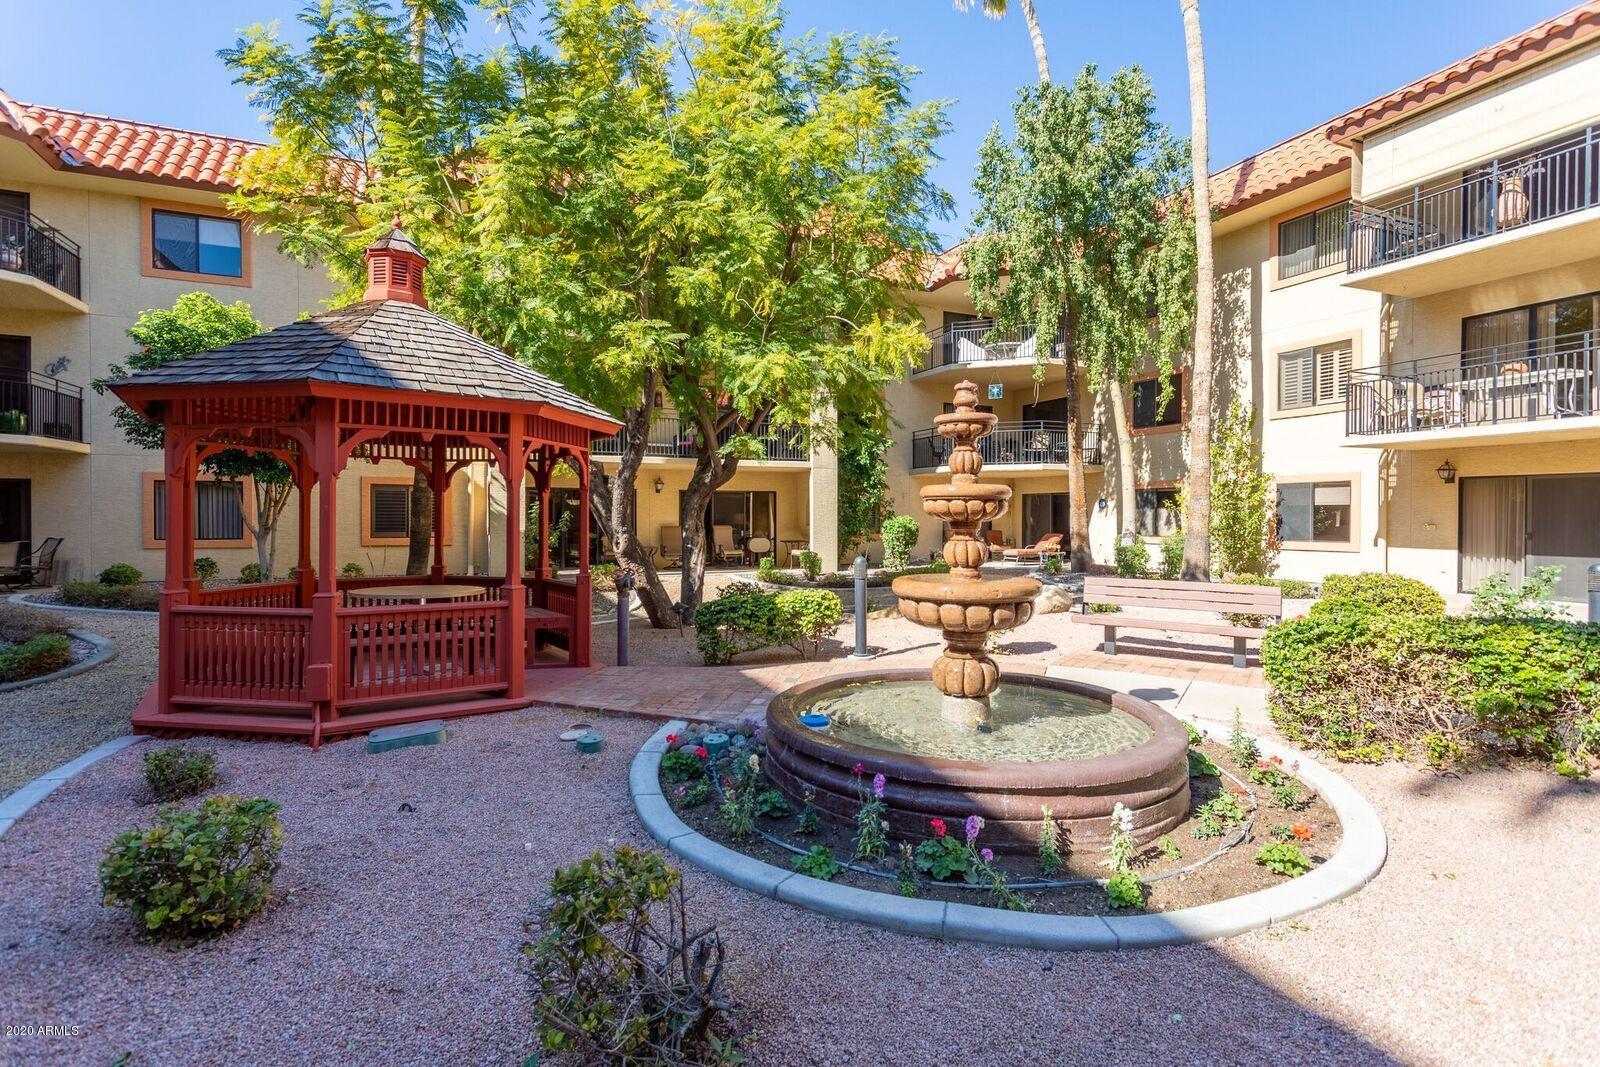 MLS 6146365 Sun City Metro Area, Sun City, AZ 85351 Sun City Homes for Rent